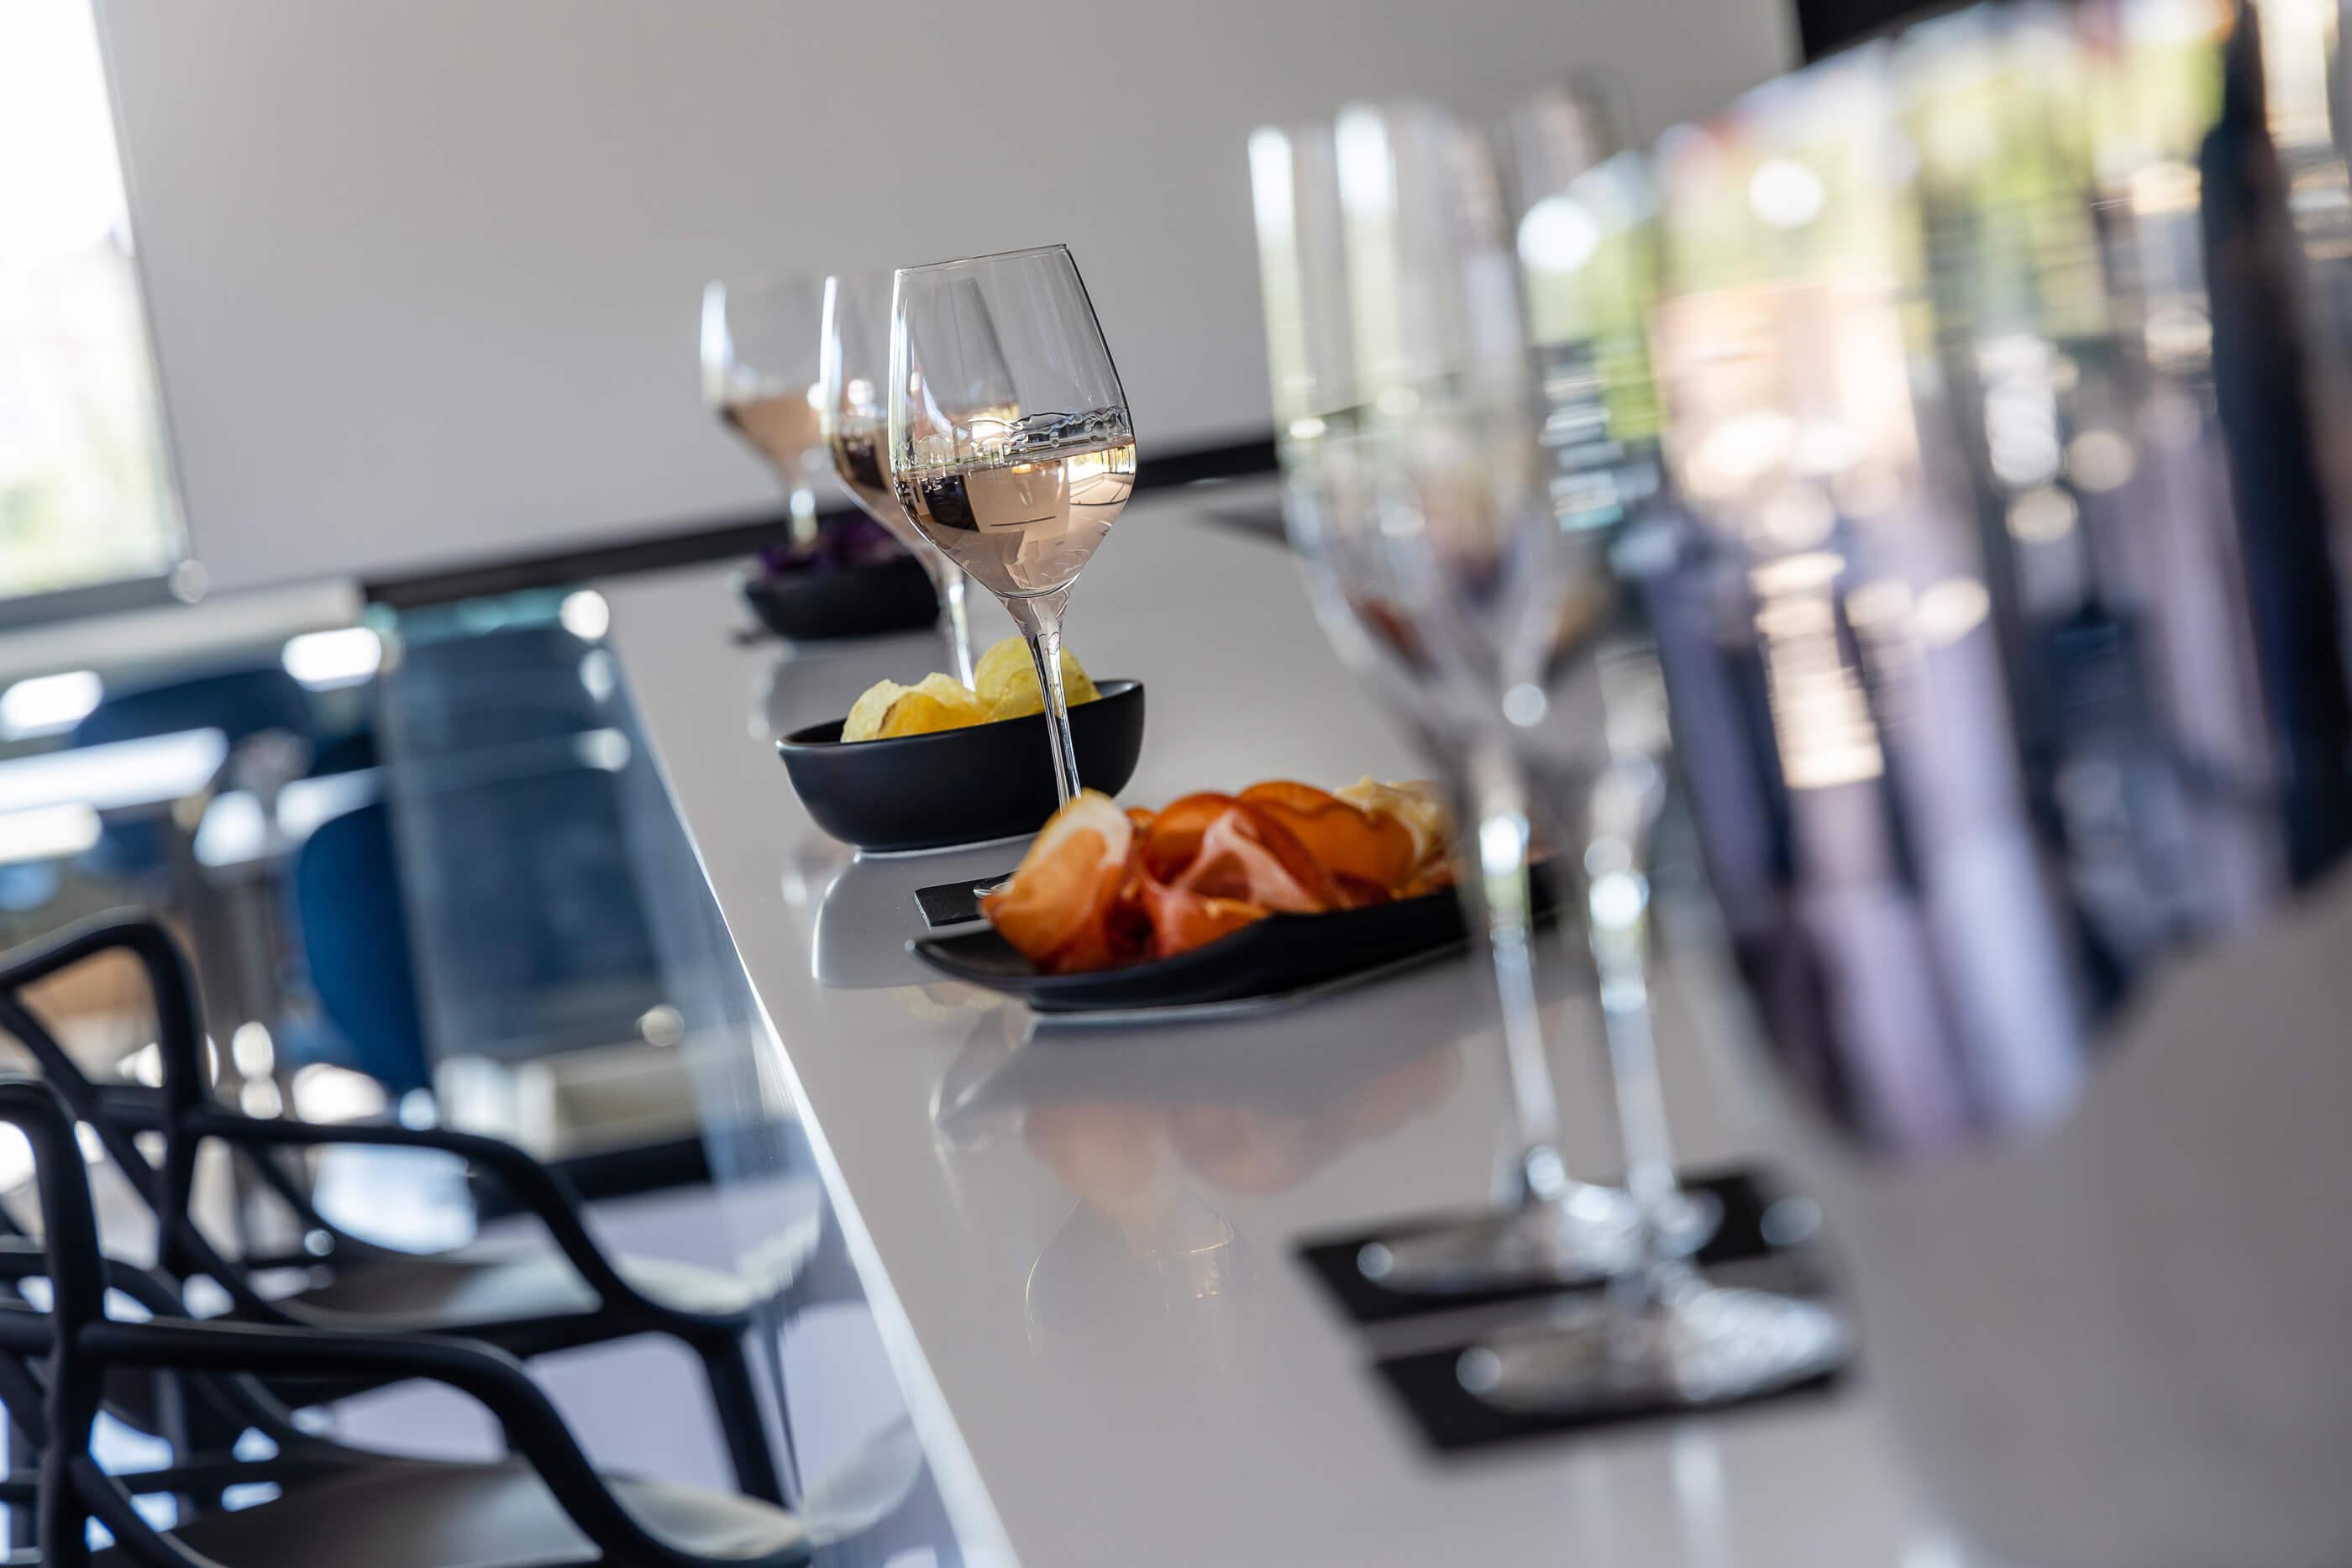 Hotel Sainte Victoire Restaurant's Dish